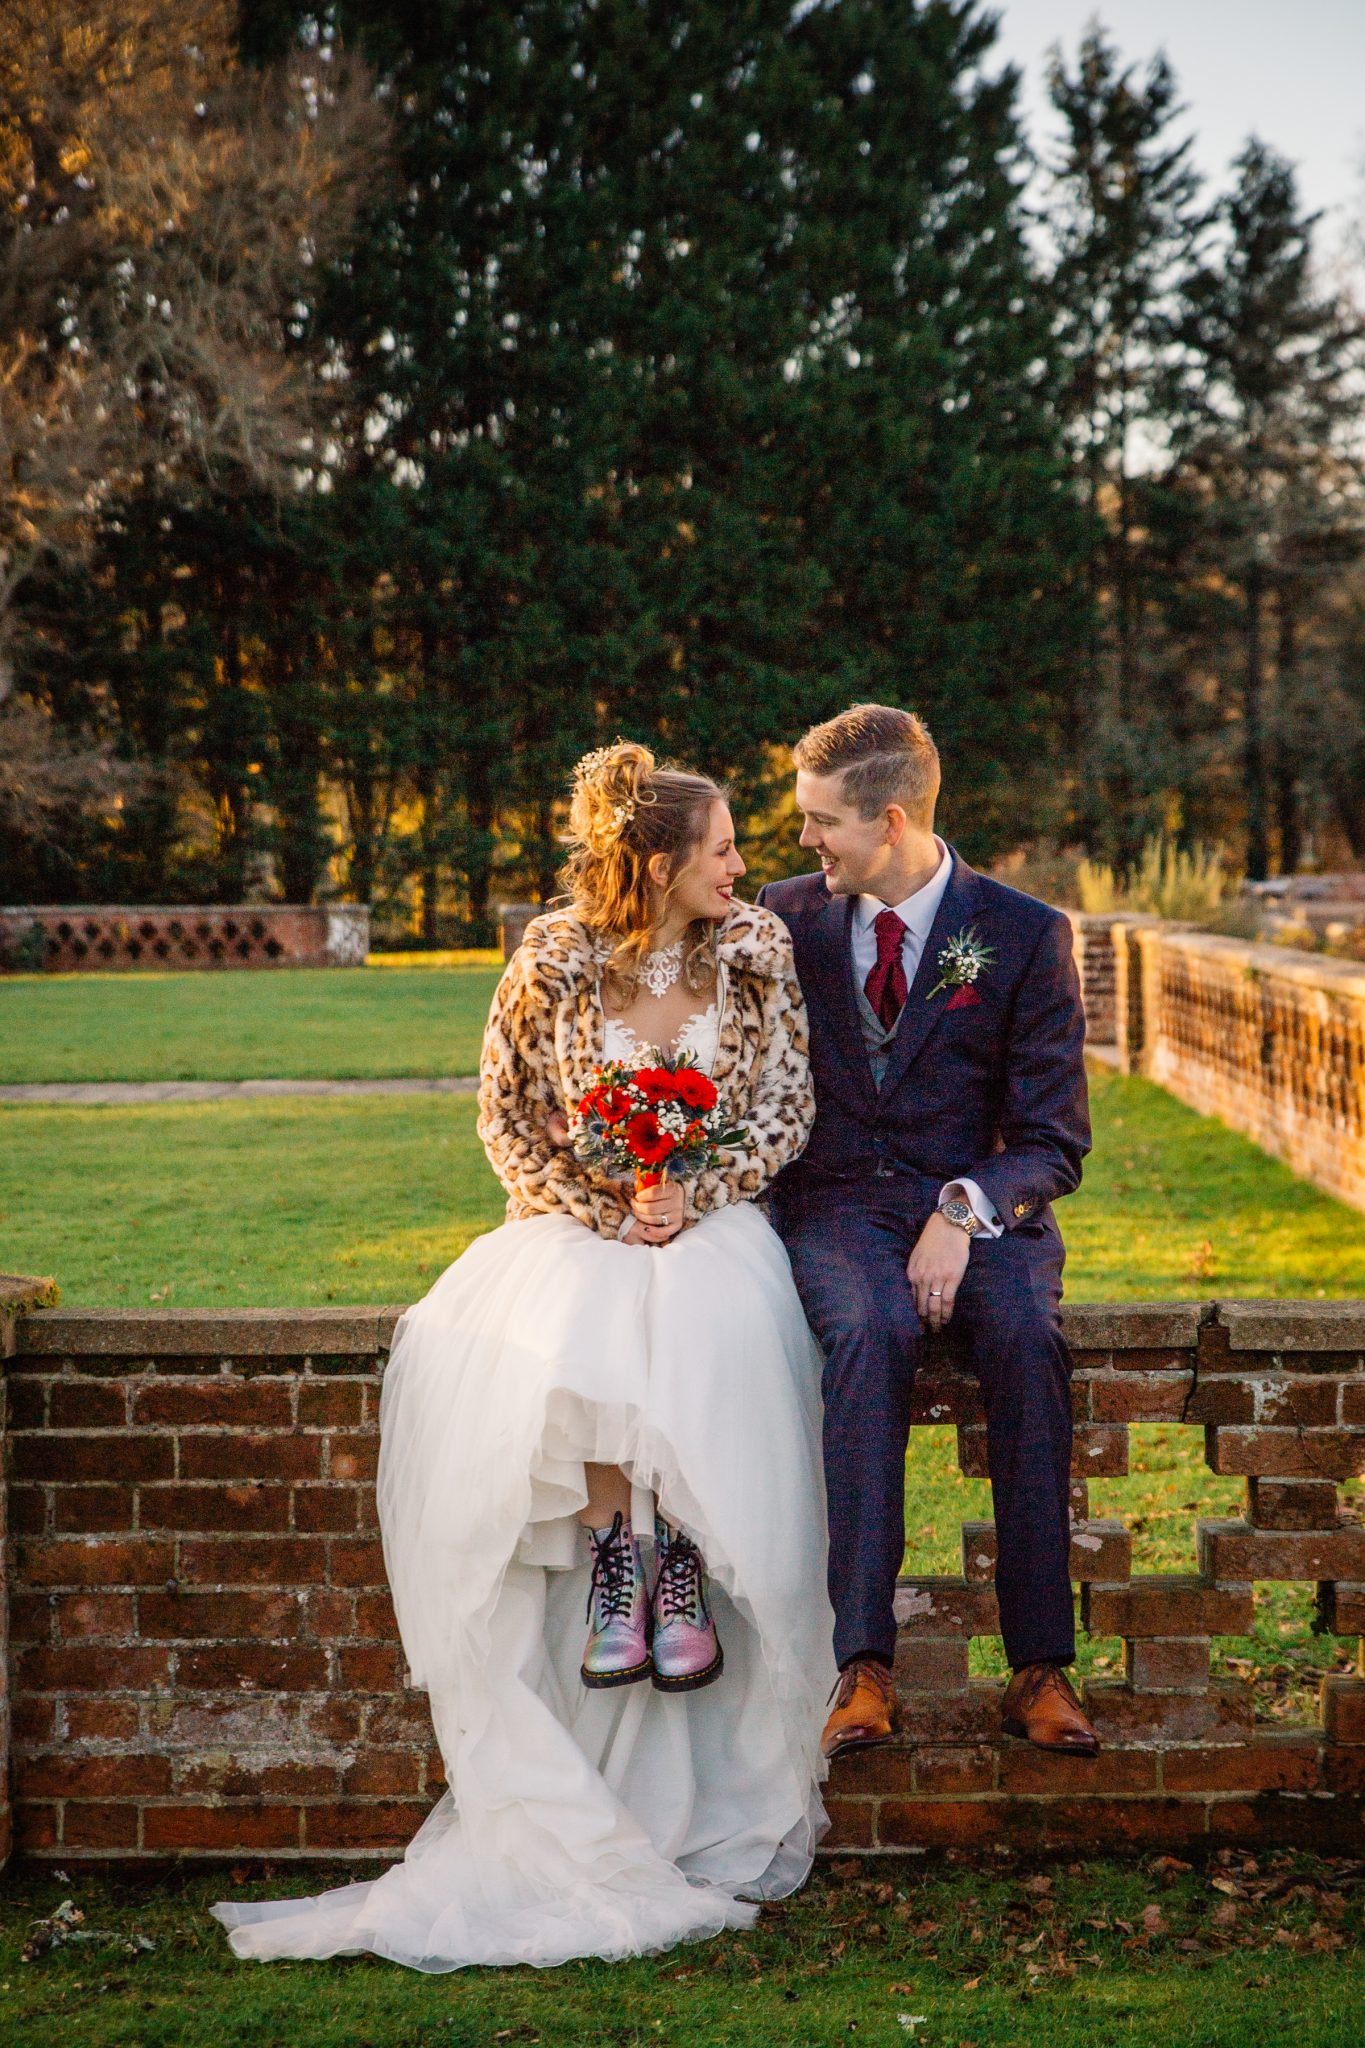 Honeymoon, Going Offline and Wedding Talk